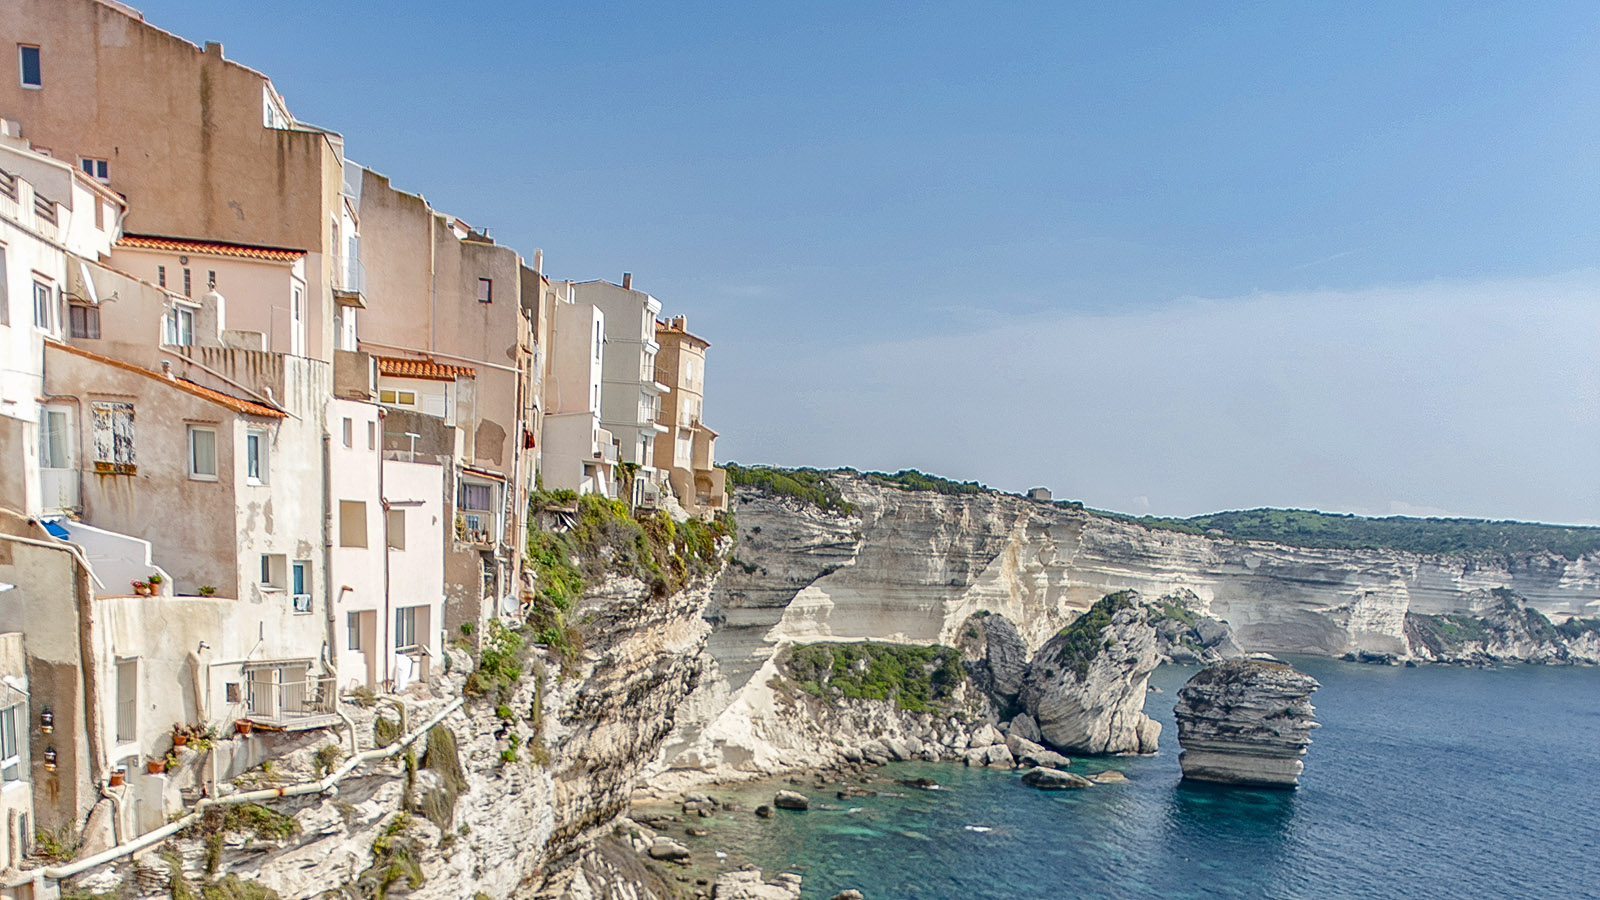 Bonifacio thront hoch auf den Kreideklippen der Südspitze Korsikas. Foto: Hilke Maunder